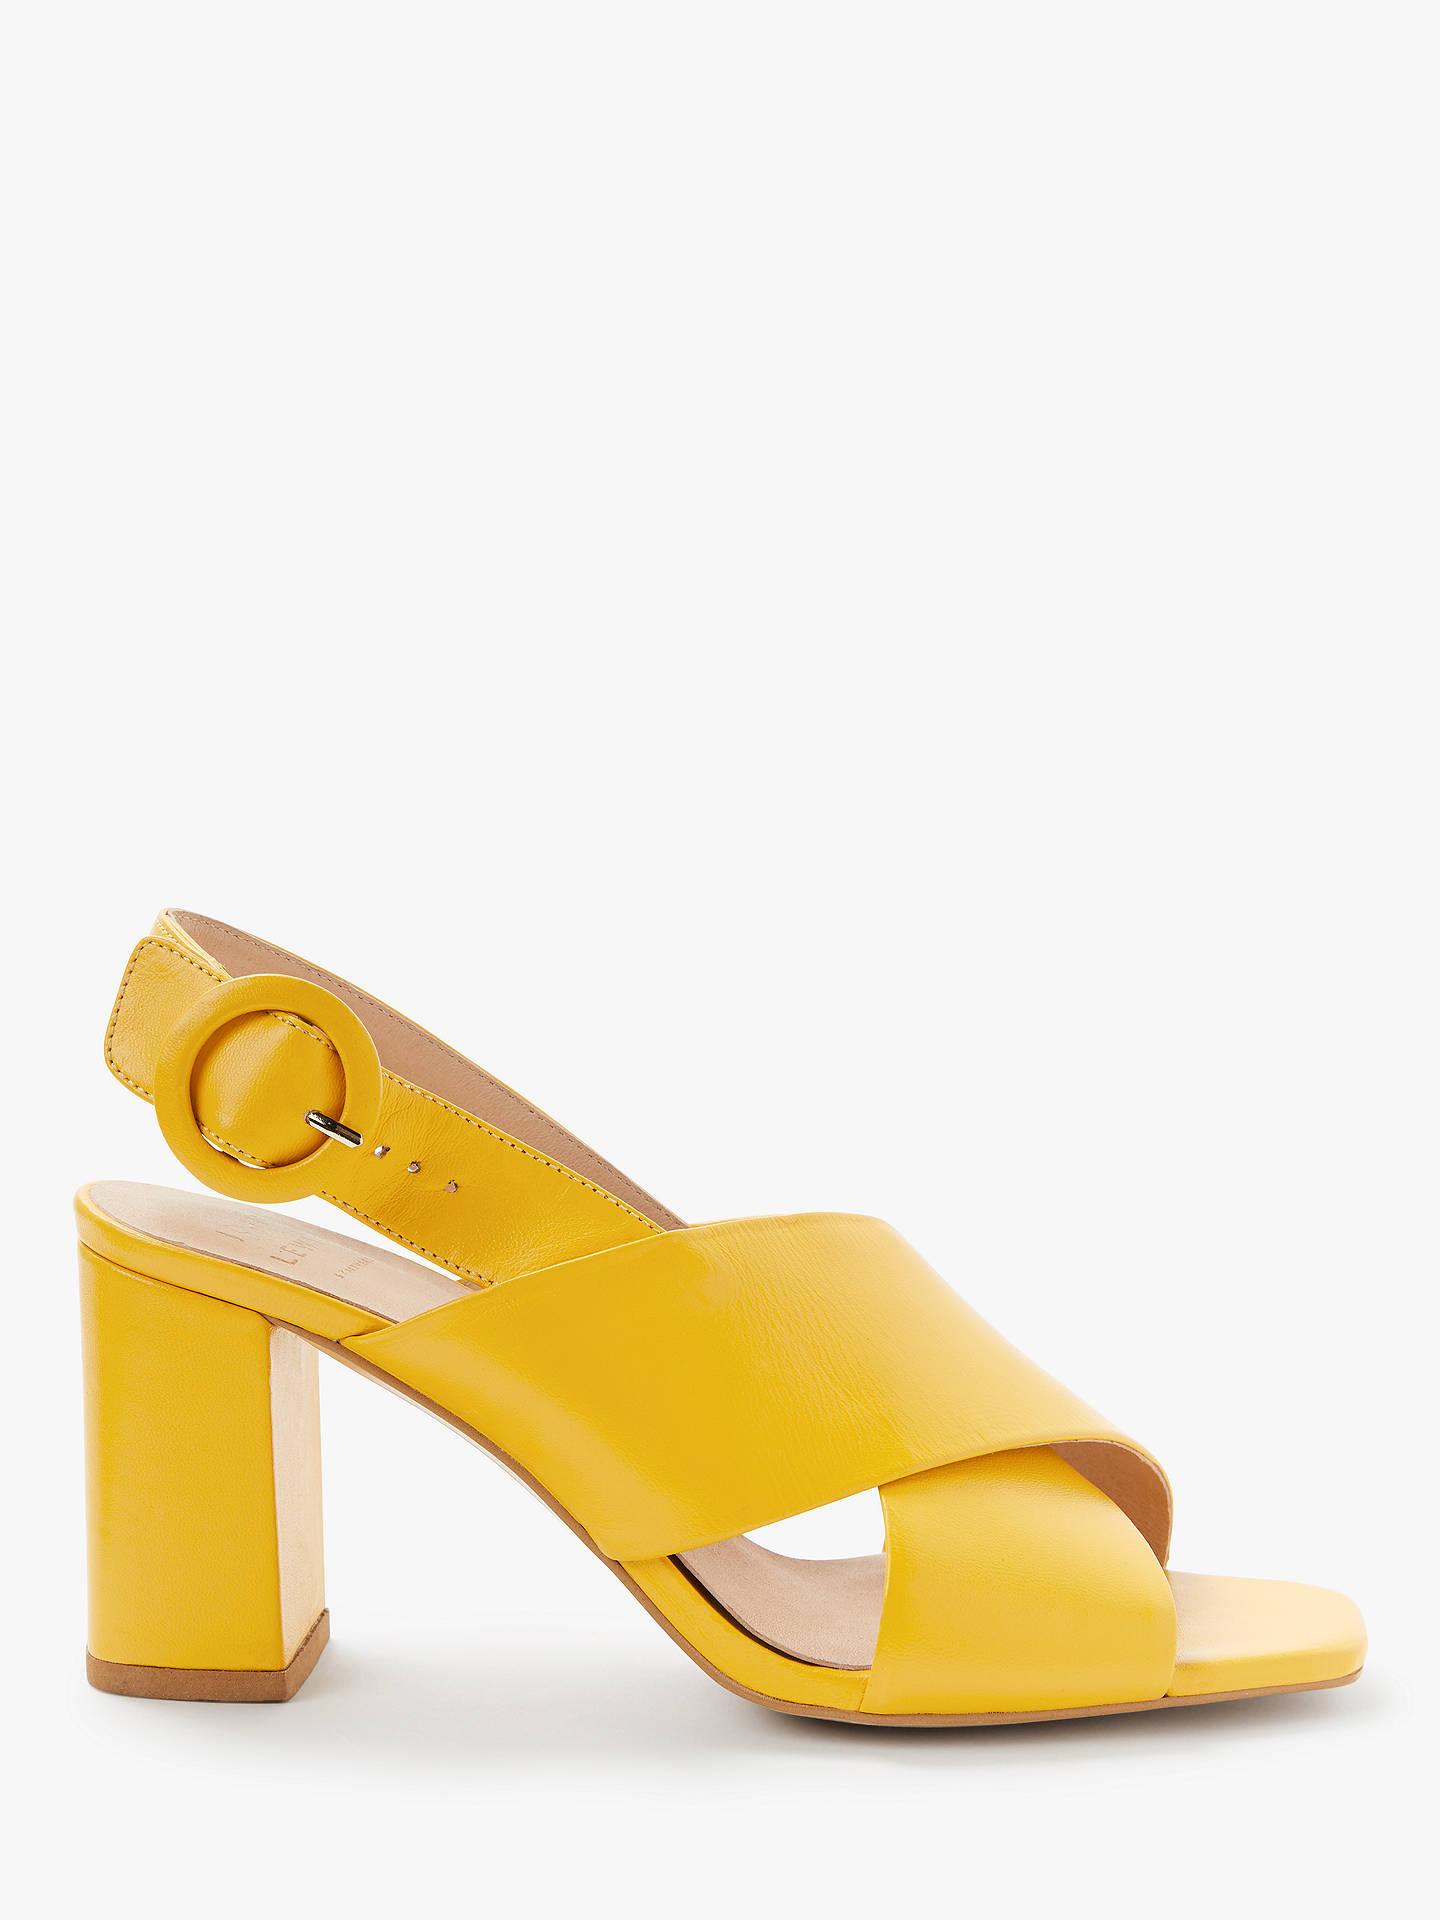 d46d0dbf22c John Lewis & Partners Jana Cross Strap Chunky Heel Sandals, Yellow Leather